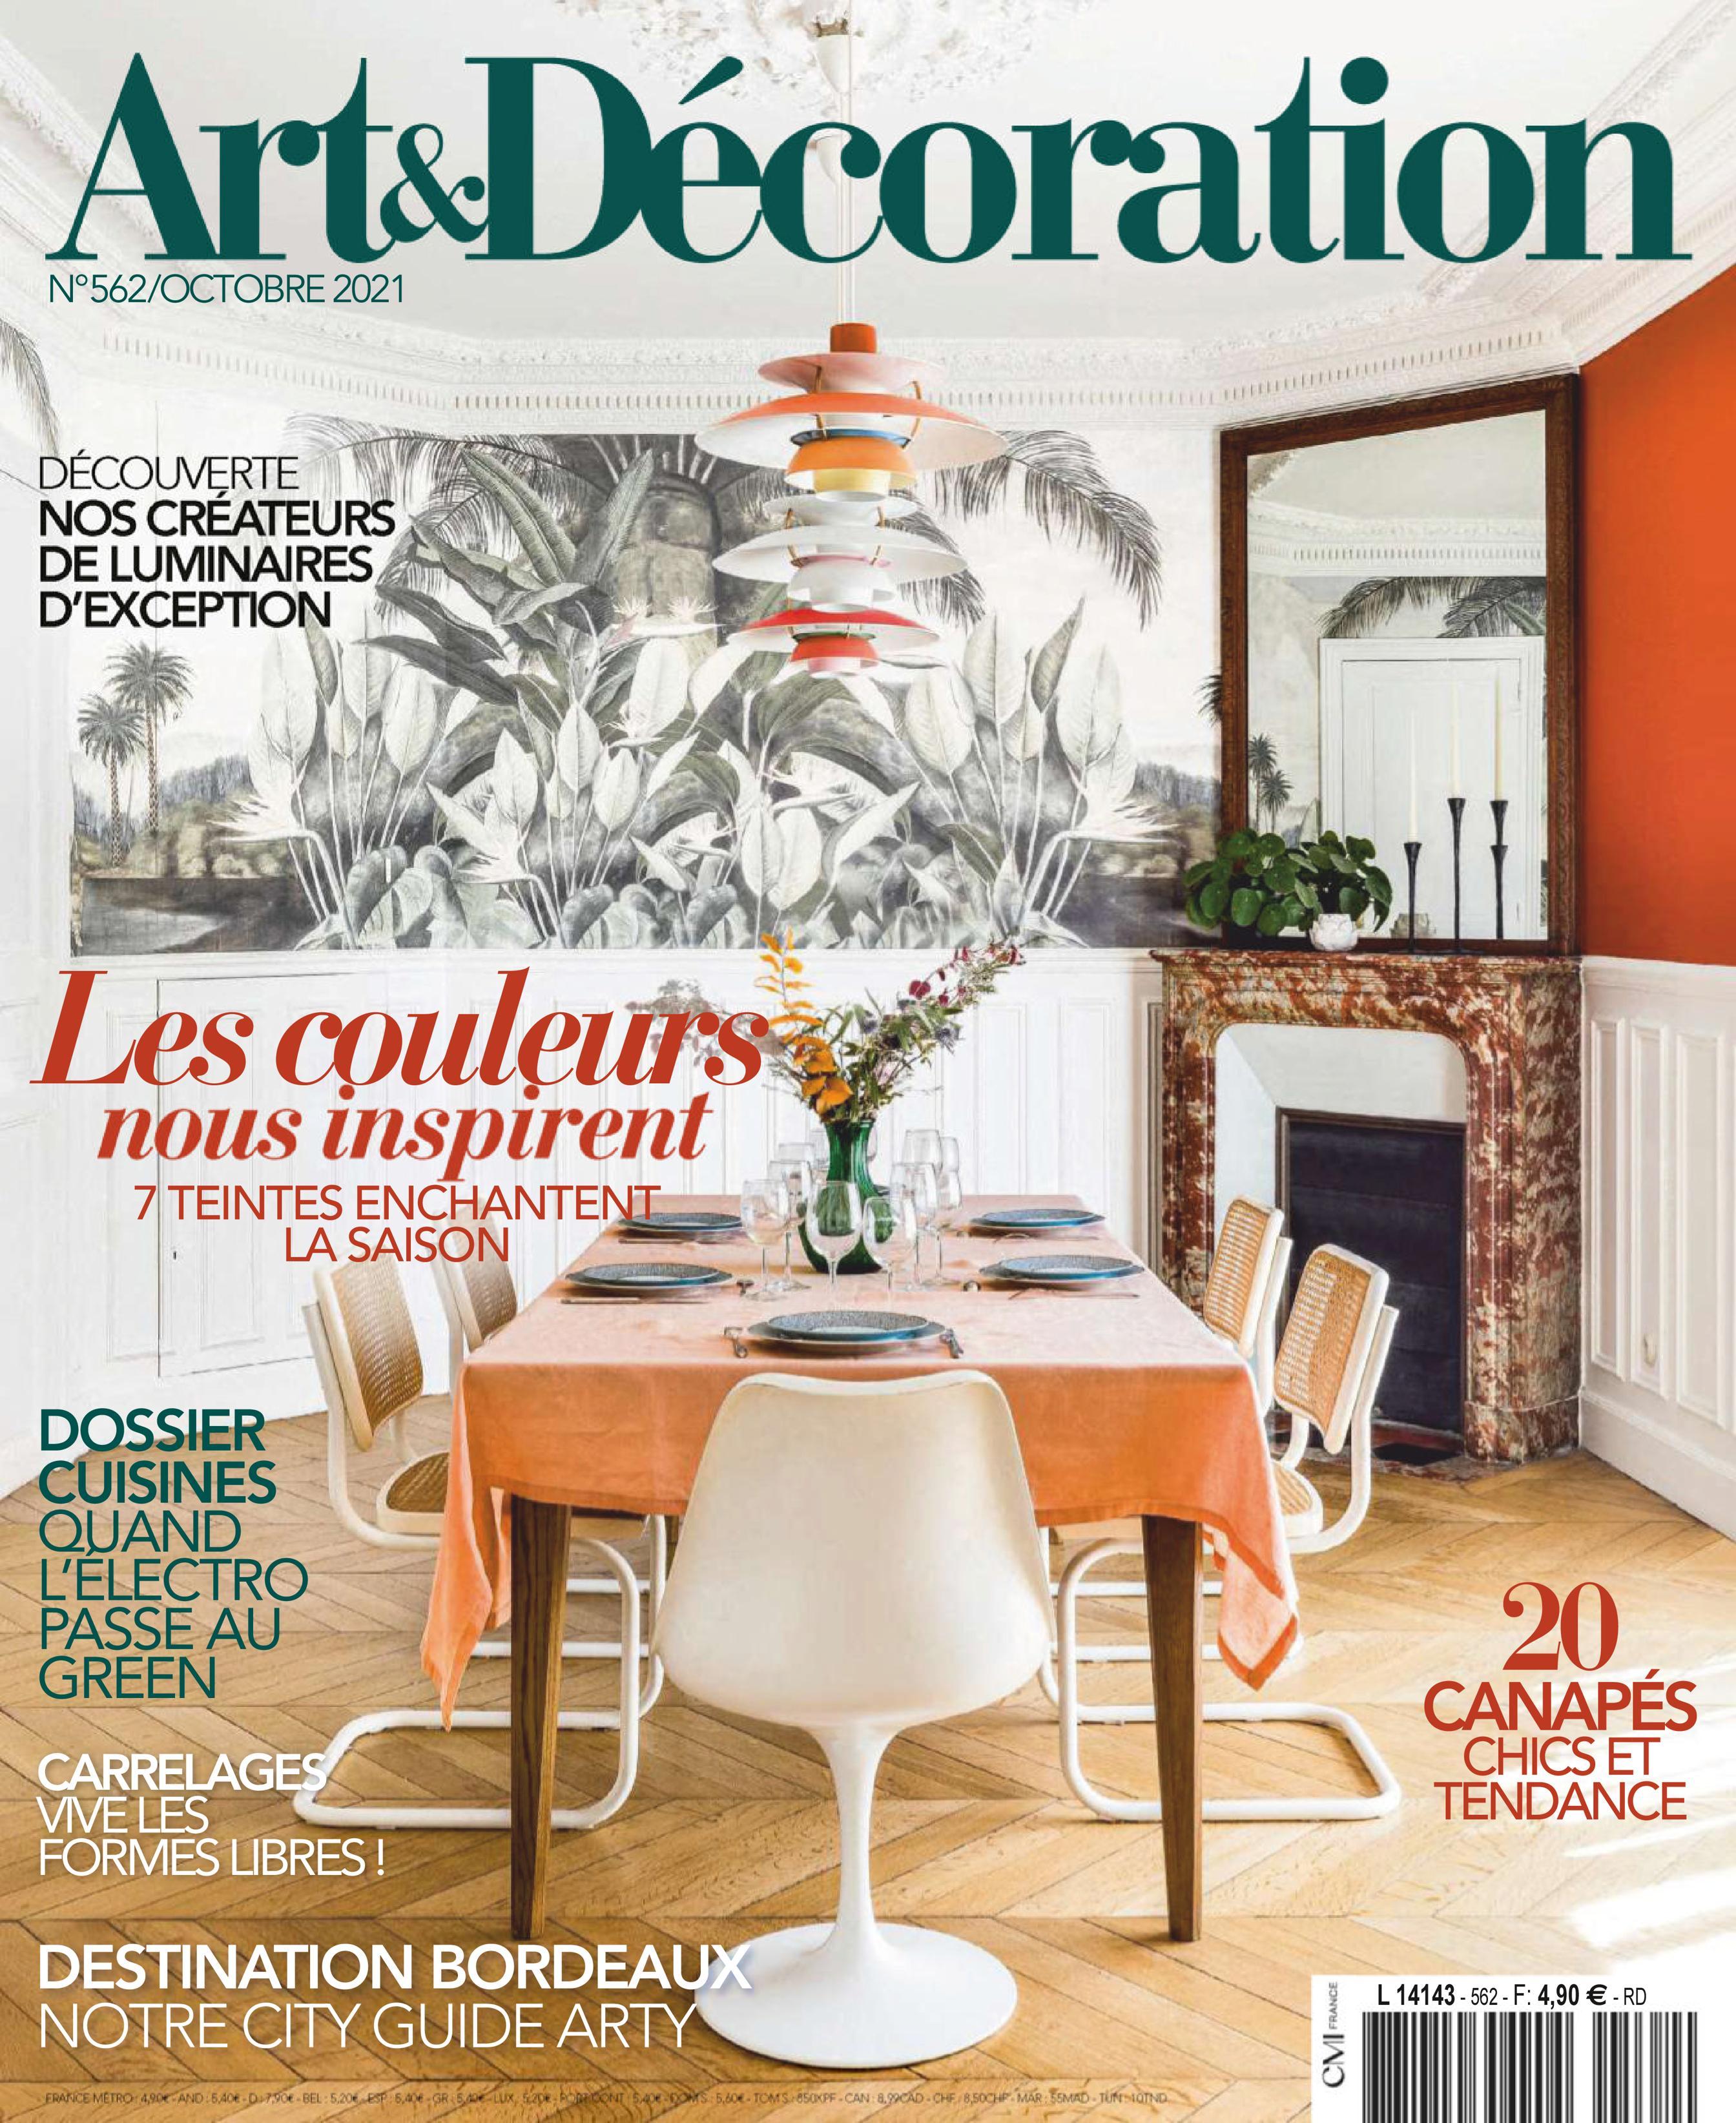 Art & Décoration - octobre 2021